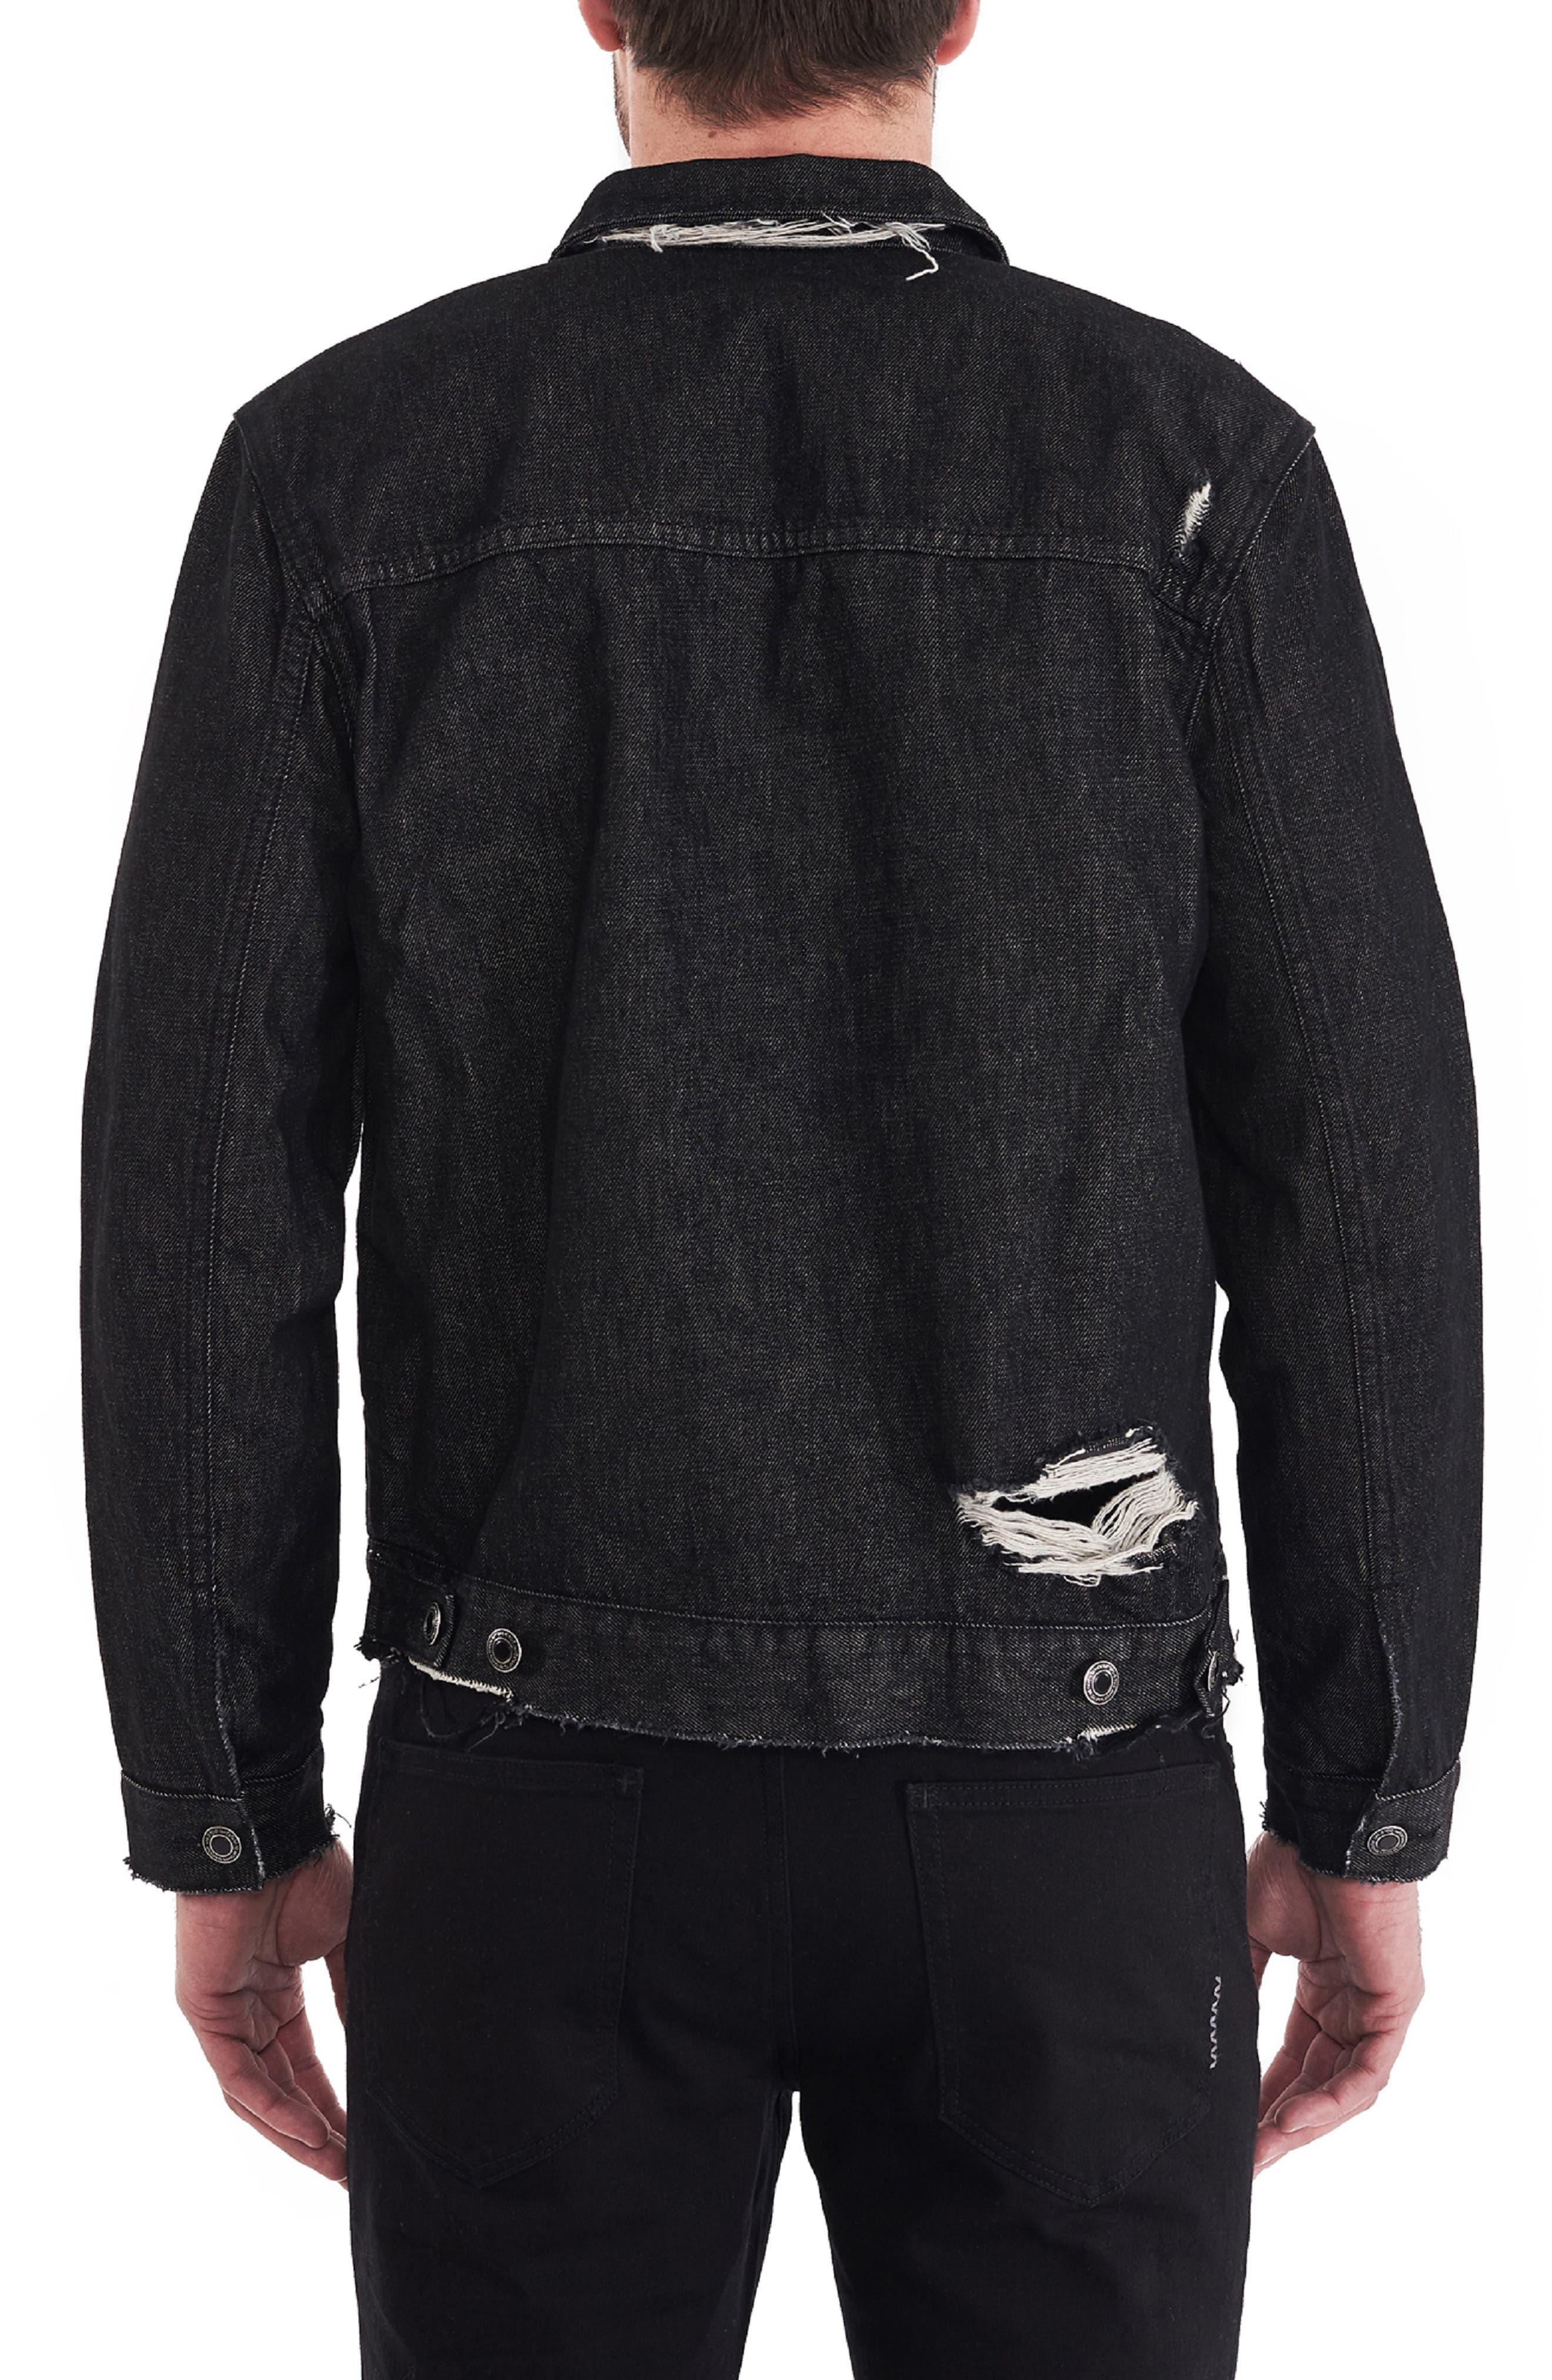 Type One Black Label Denim Jacket,                             Alternate thumbnail 2, color,                             BLACK LABEL